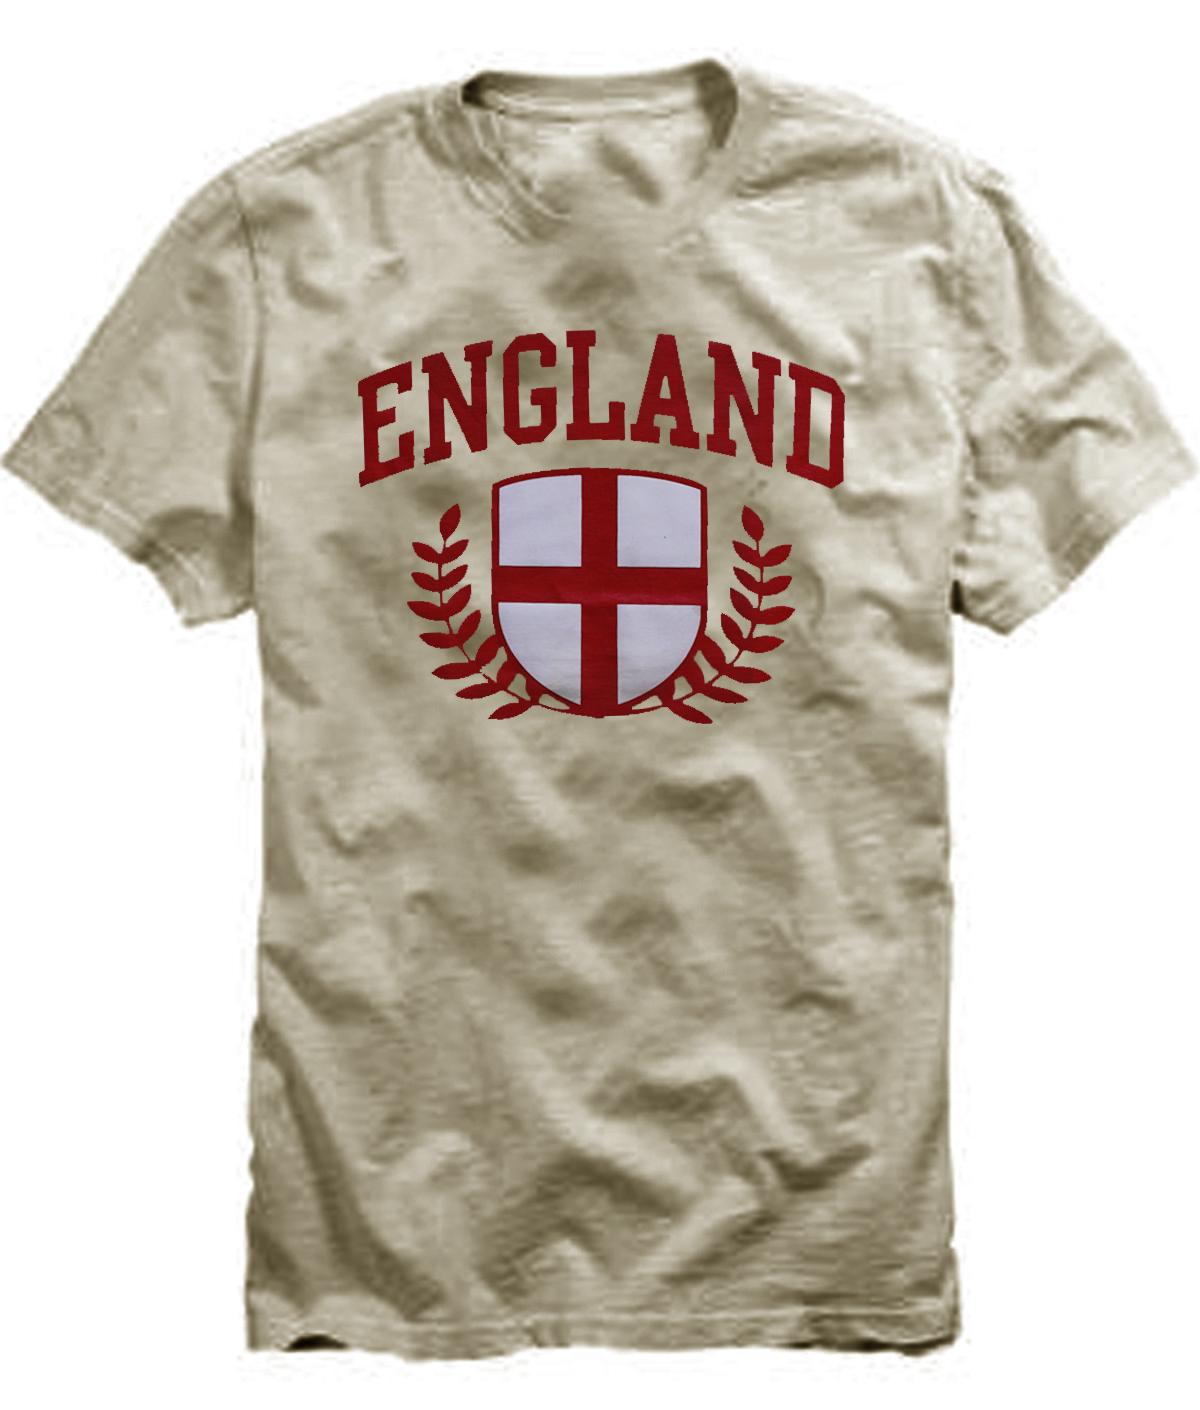 T-Shirt / Kaos Pria (England) 3916-8871